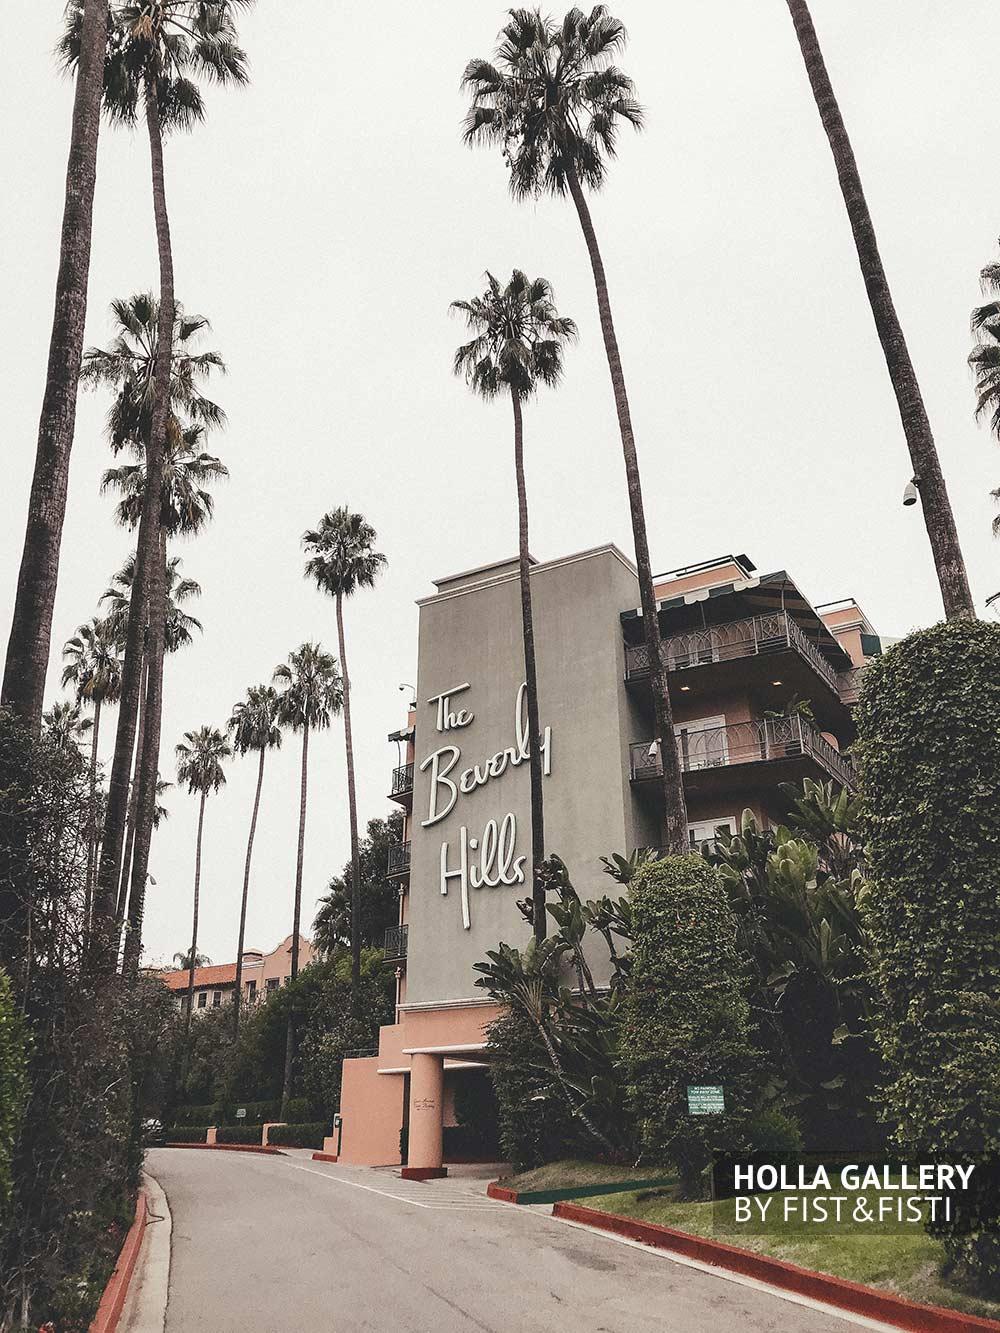 Beverly Hills, отель, небо, пальмы